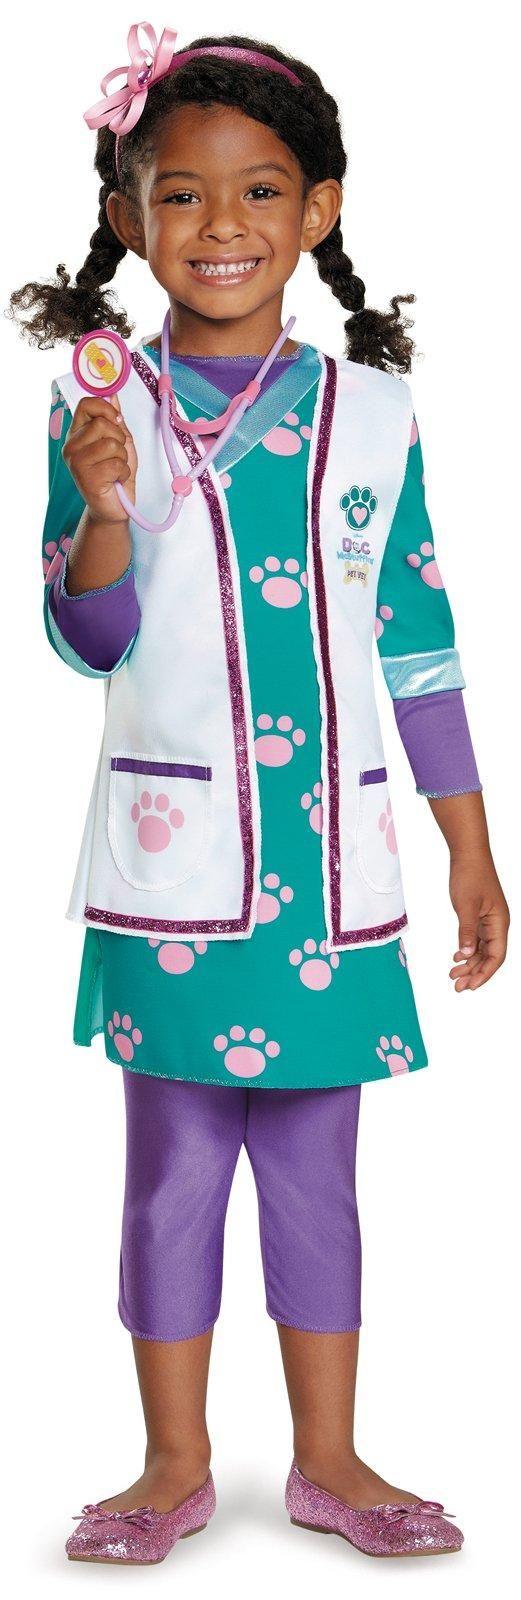 Best 25+ Doc mcstuffins halloween costume ideas on Pinterest | Doc ...